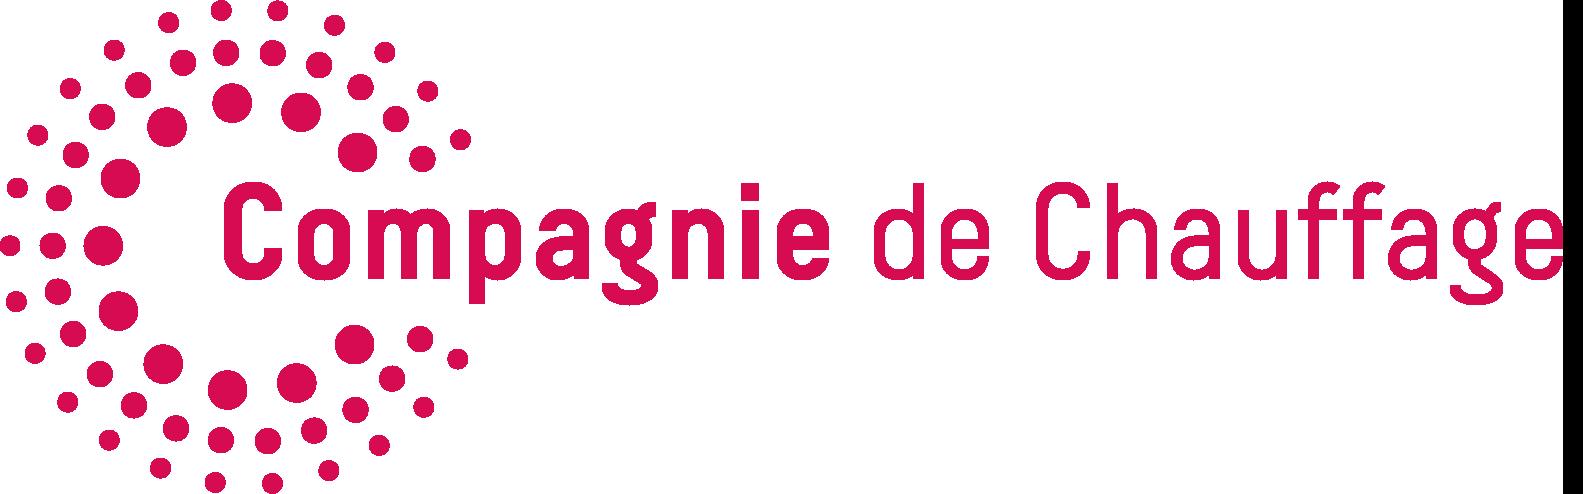 Logo Compagnie du Chauffage